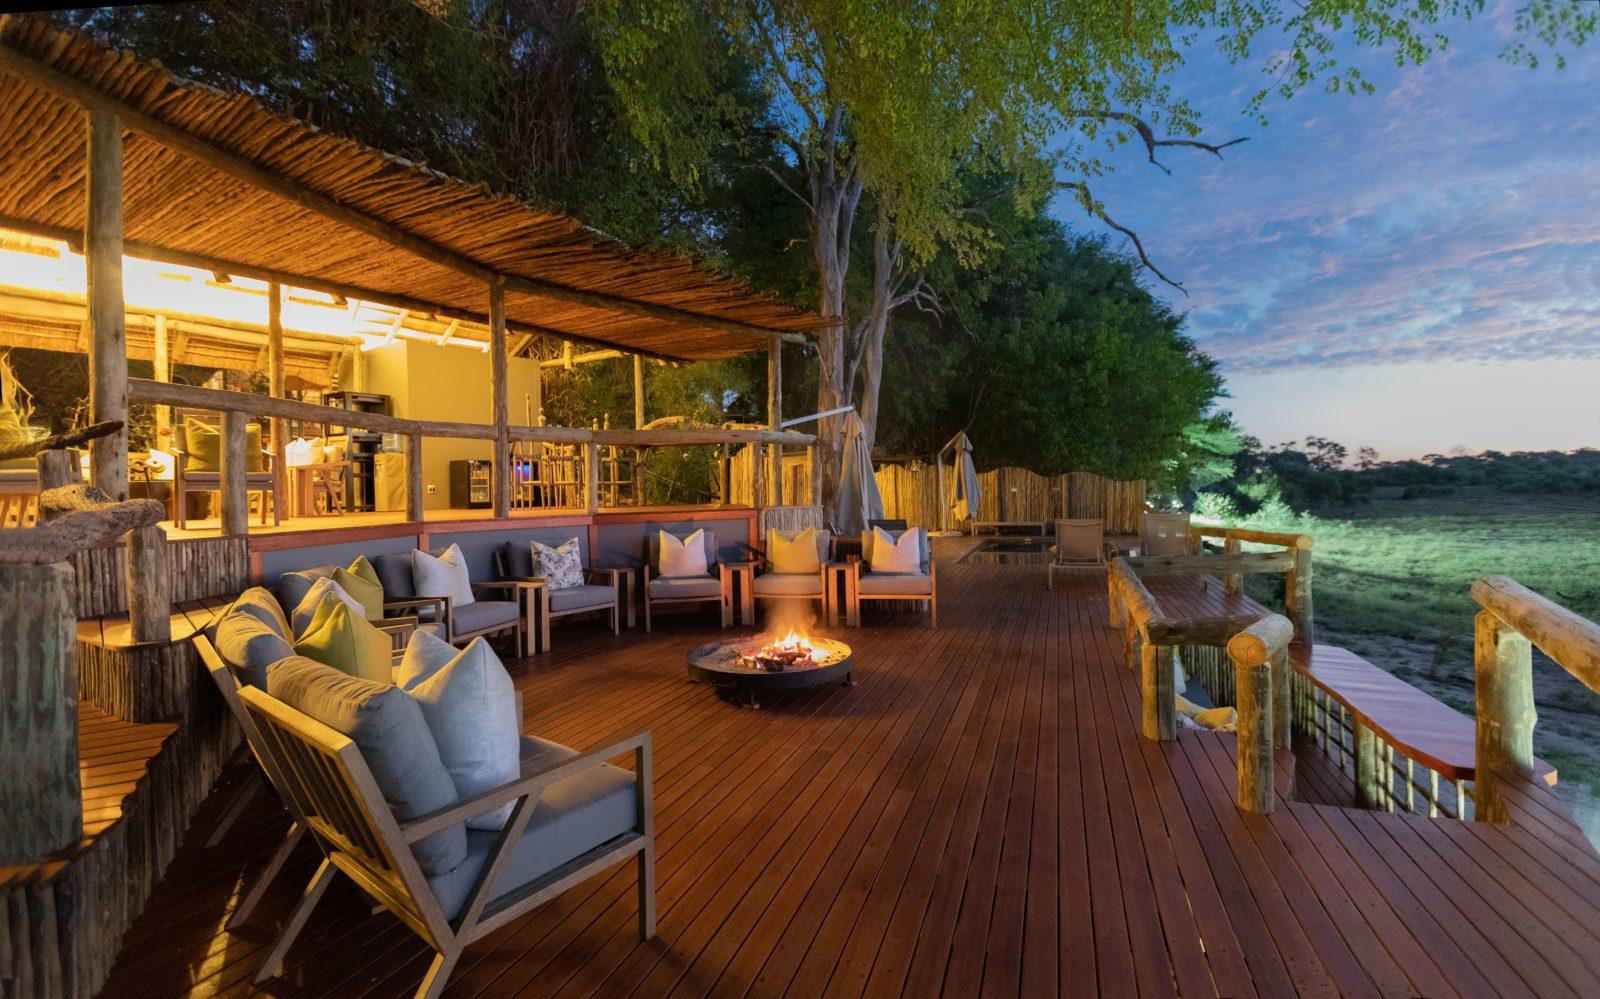 Fire deck focal point at sunrise at Savute Safari Lodge